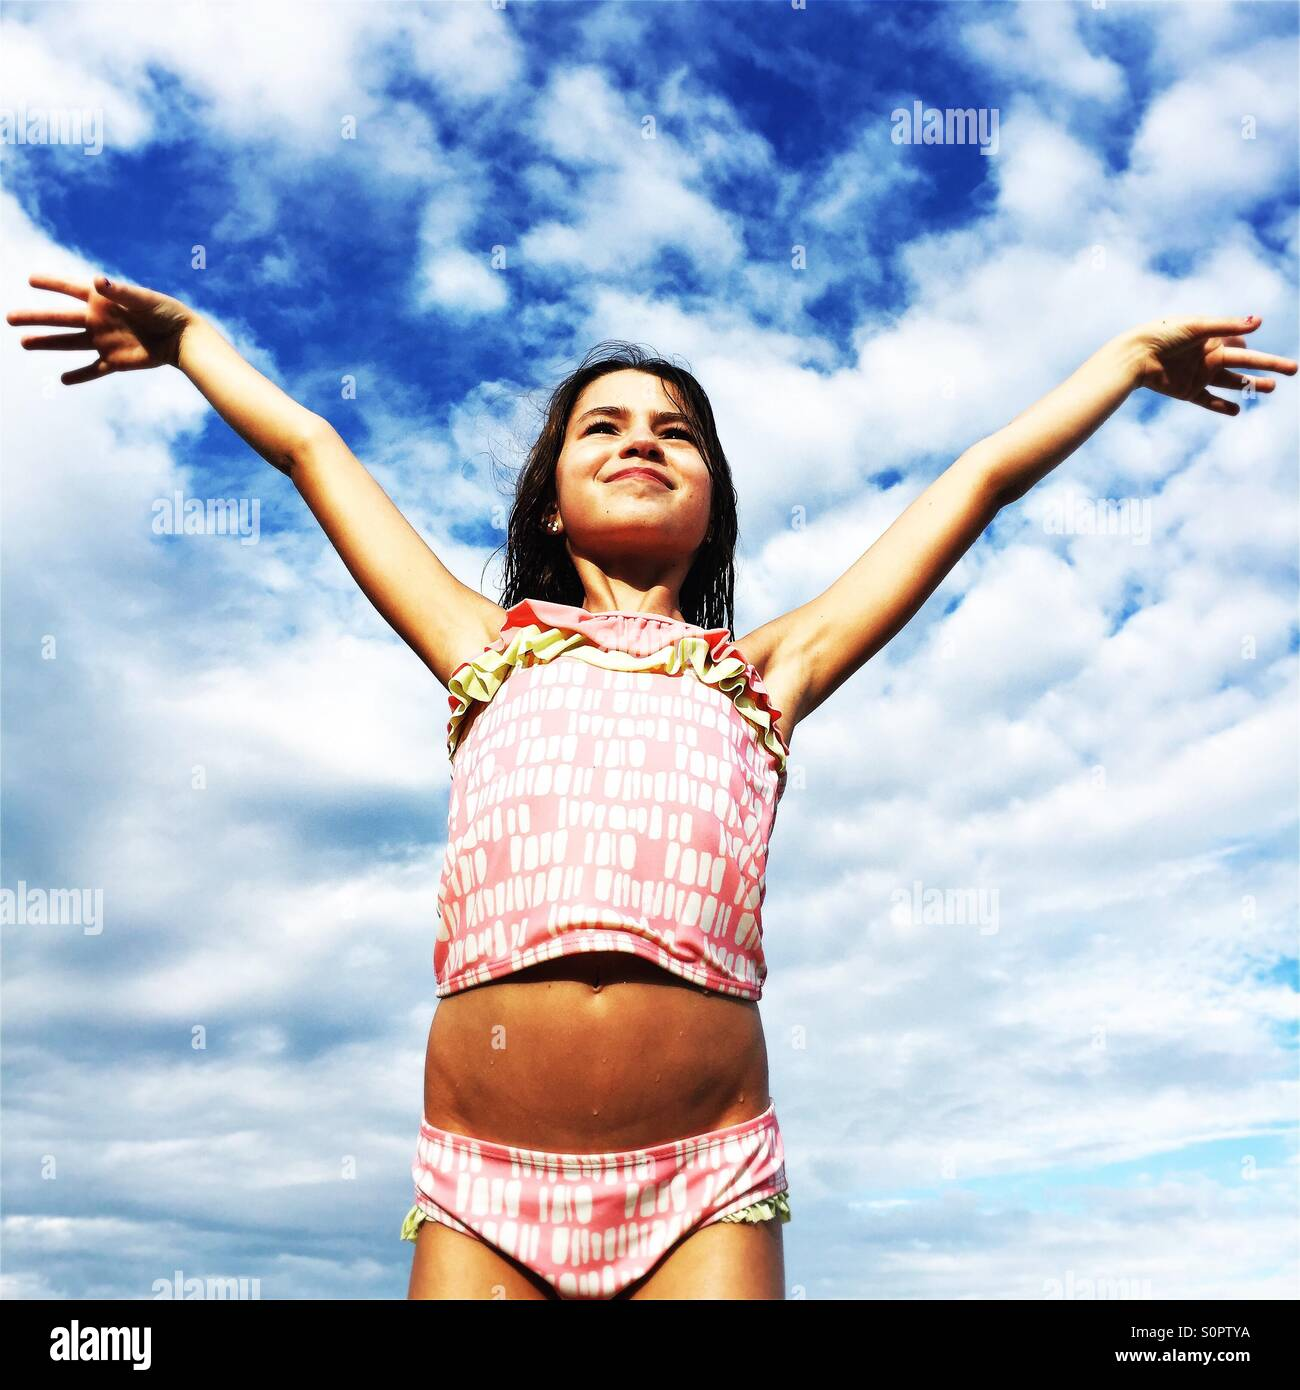 Girl in bathing suit - Stock Image